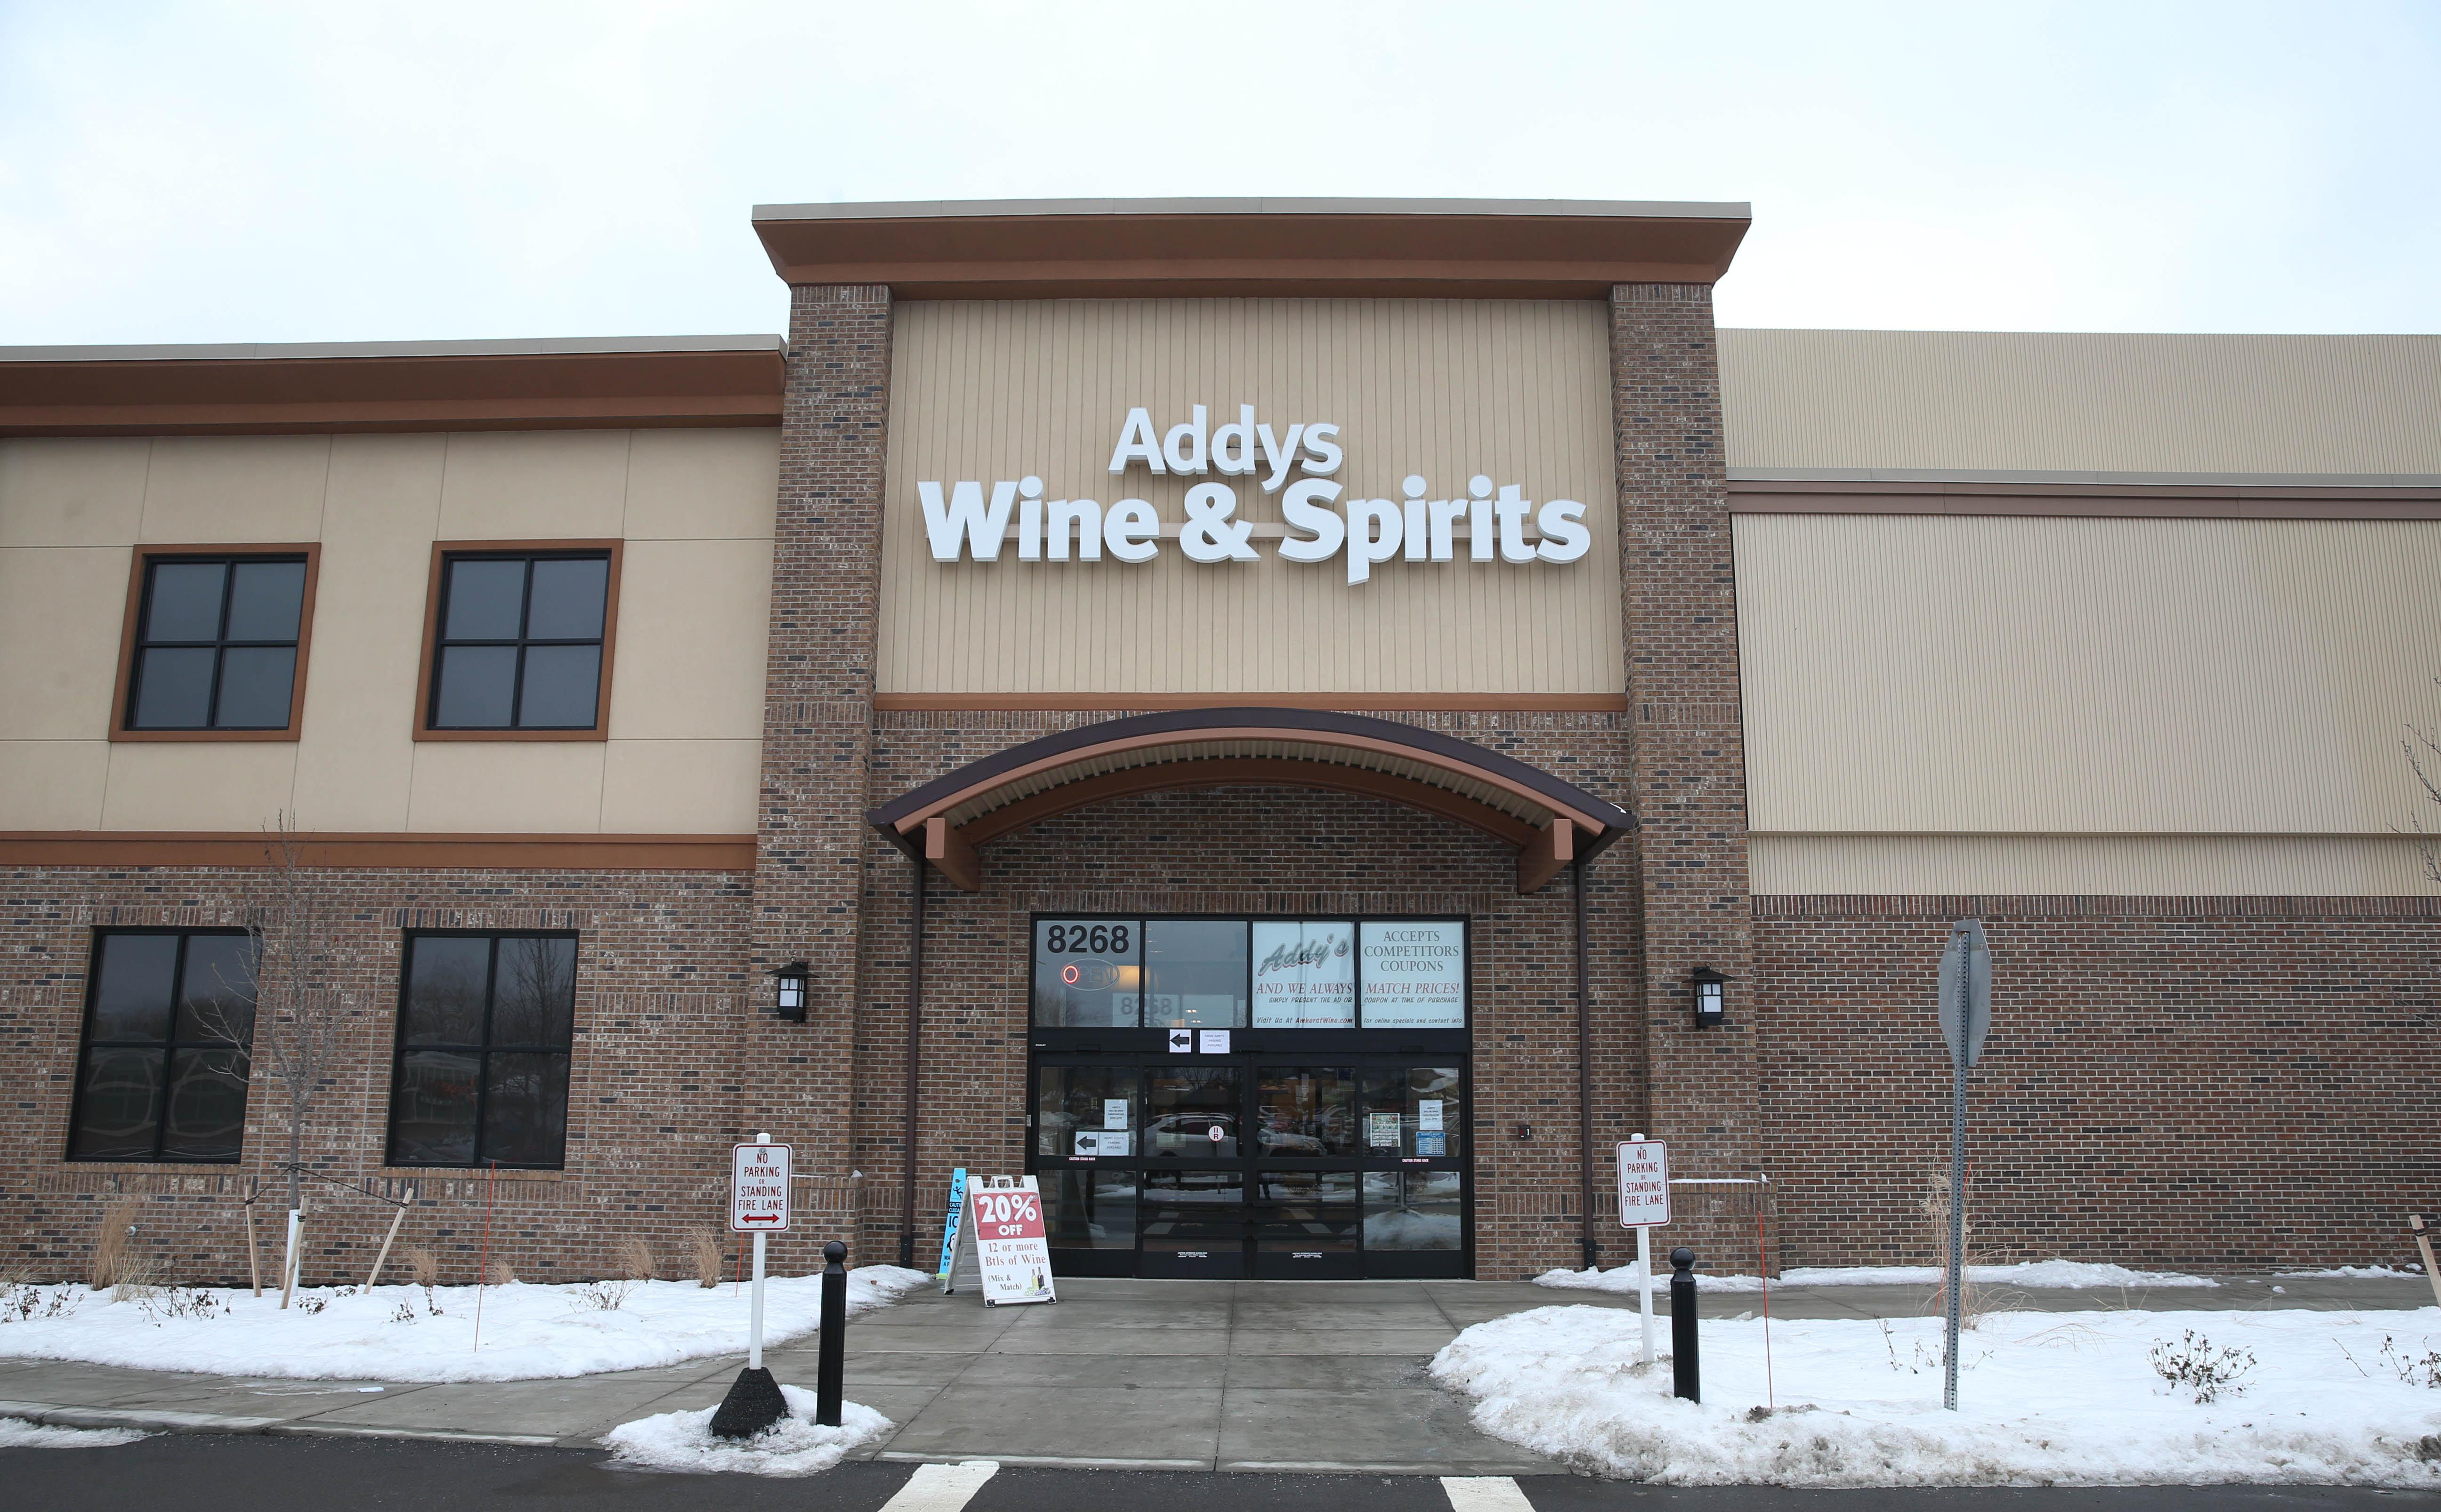 Addy's Wine & Spirits in Amherst. (Sharon Cantillon/Buffalo News)